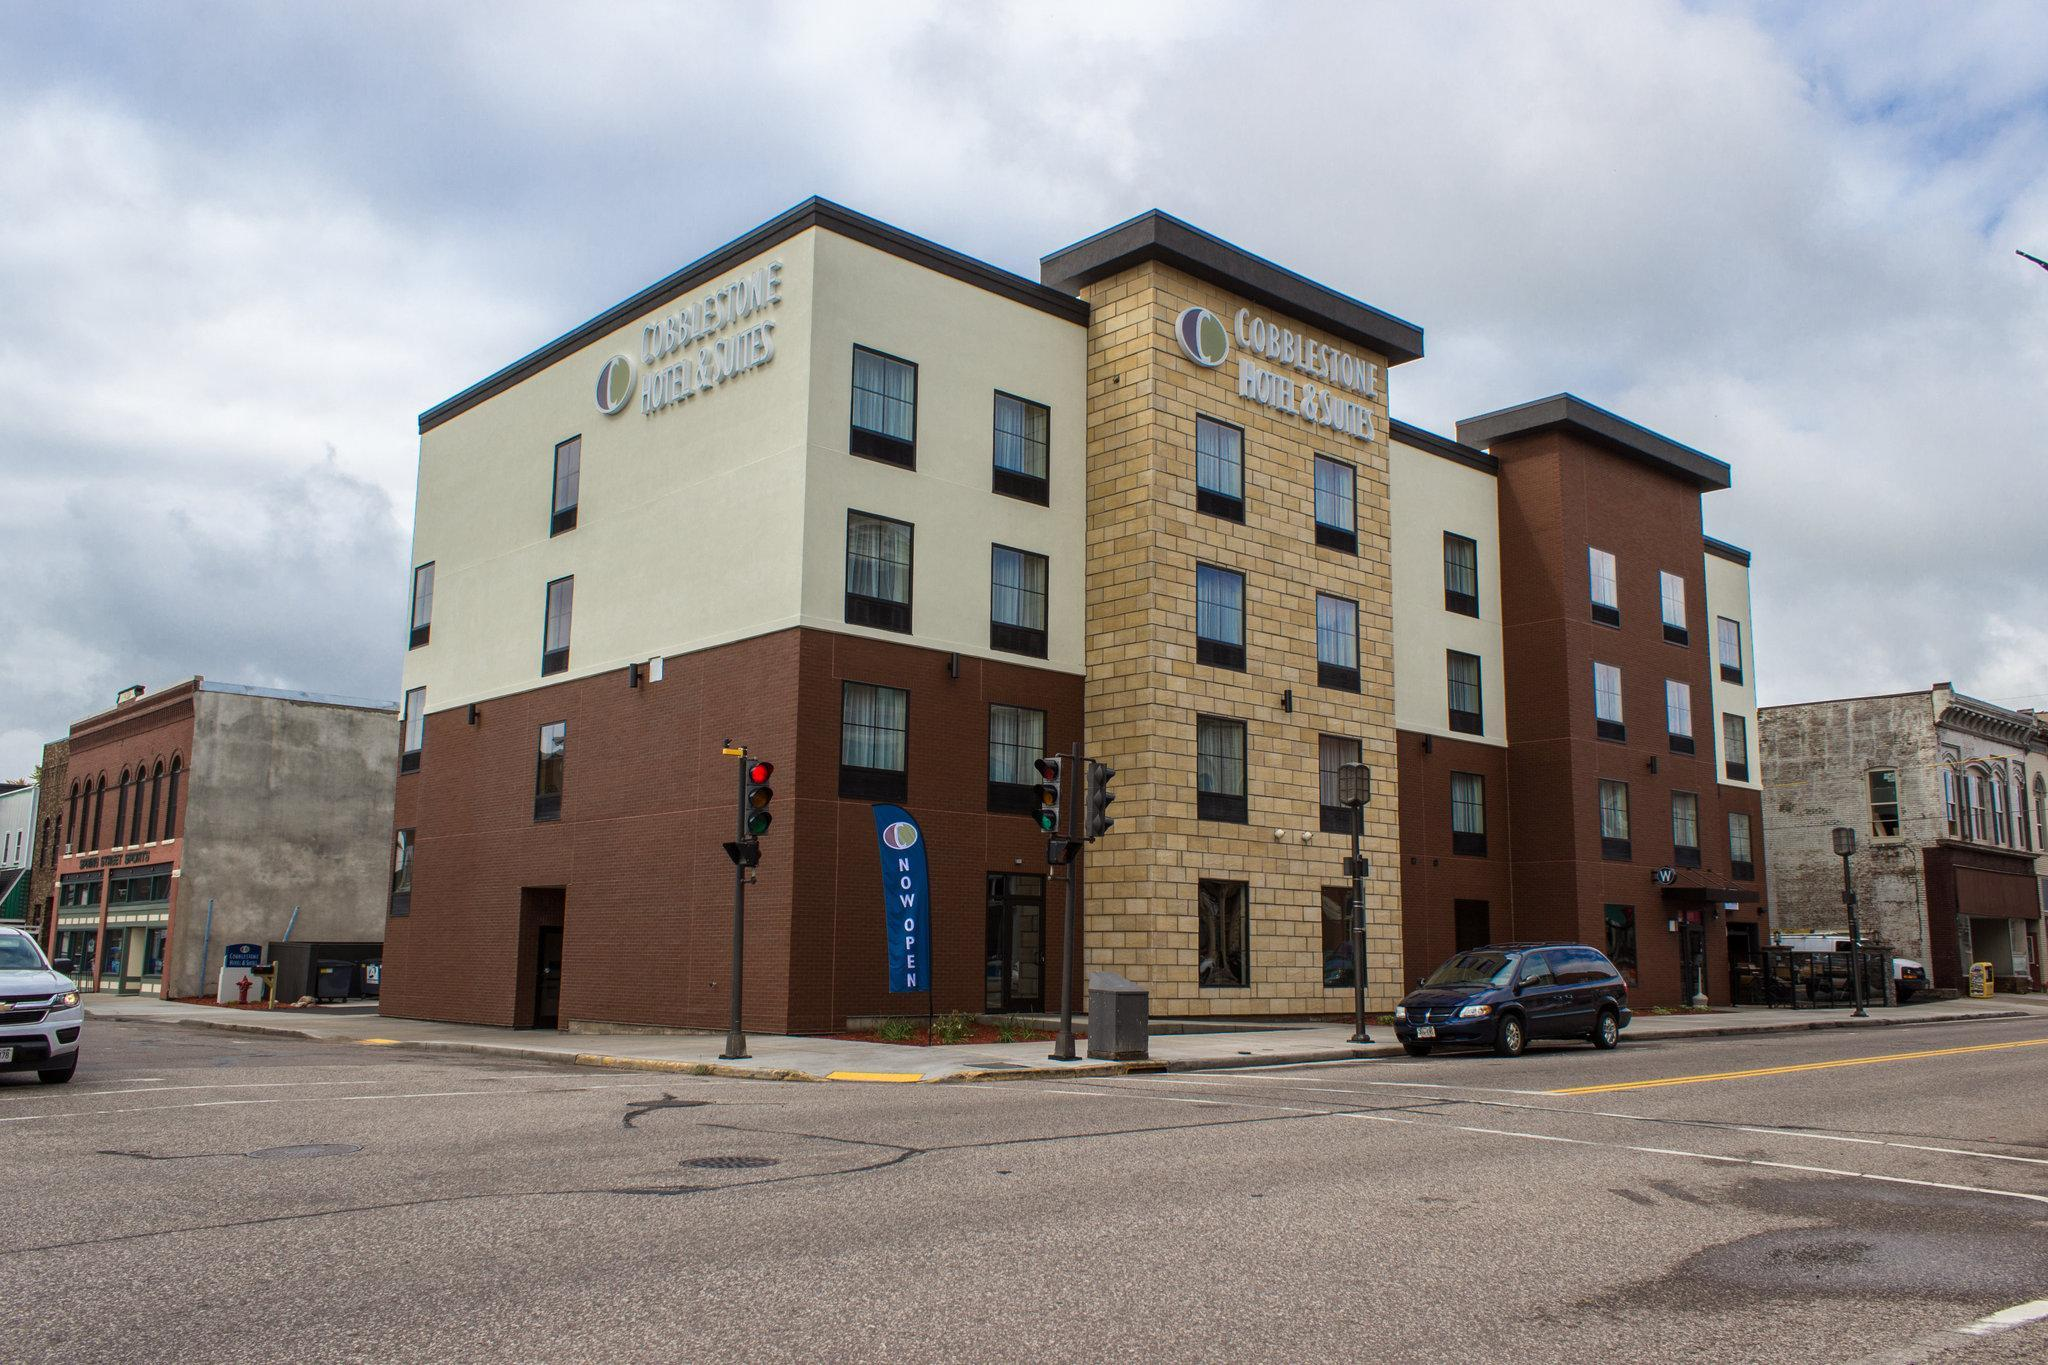 Cobblestone Hotel and Suites - Newton